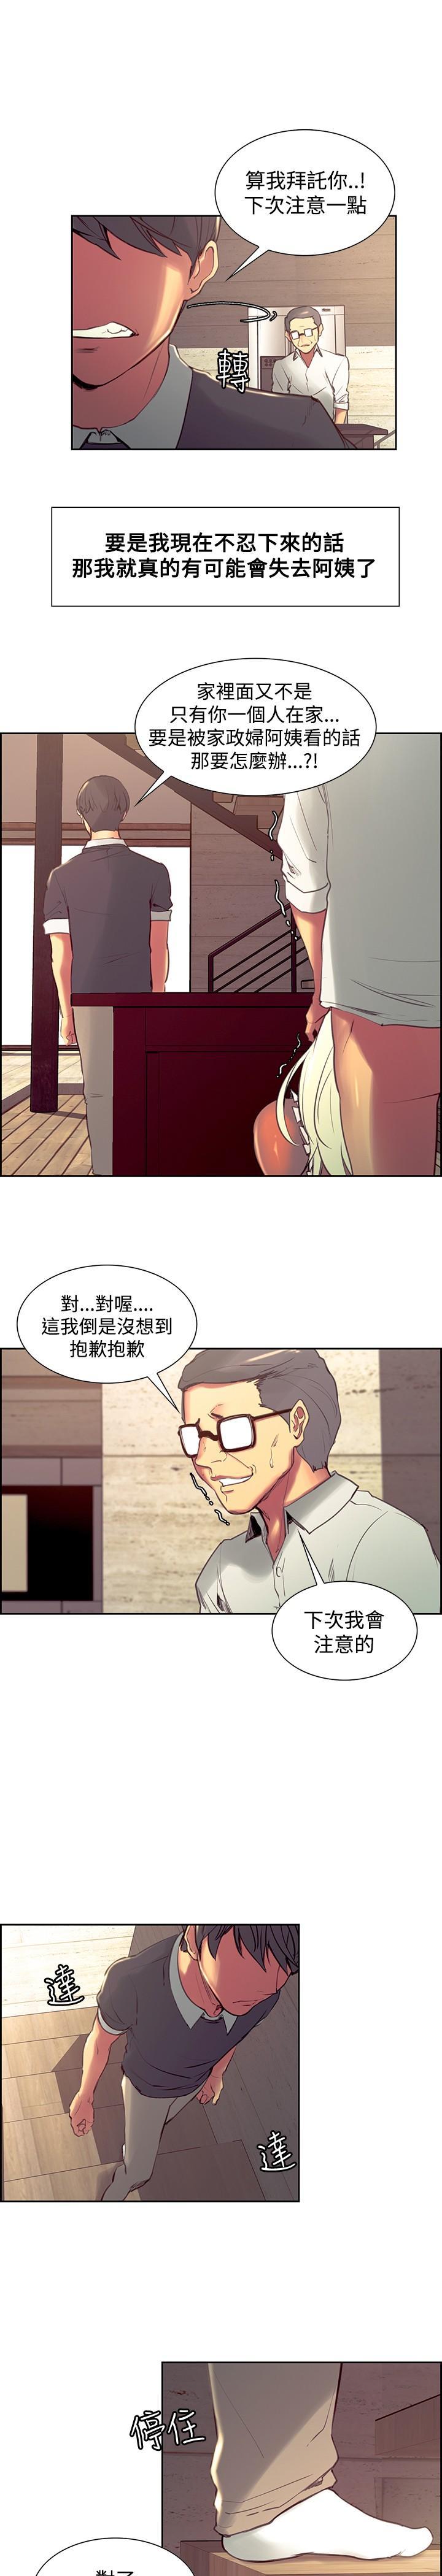 Domesticate the Housekeeper 调教家政妇 ch.29-32 62